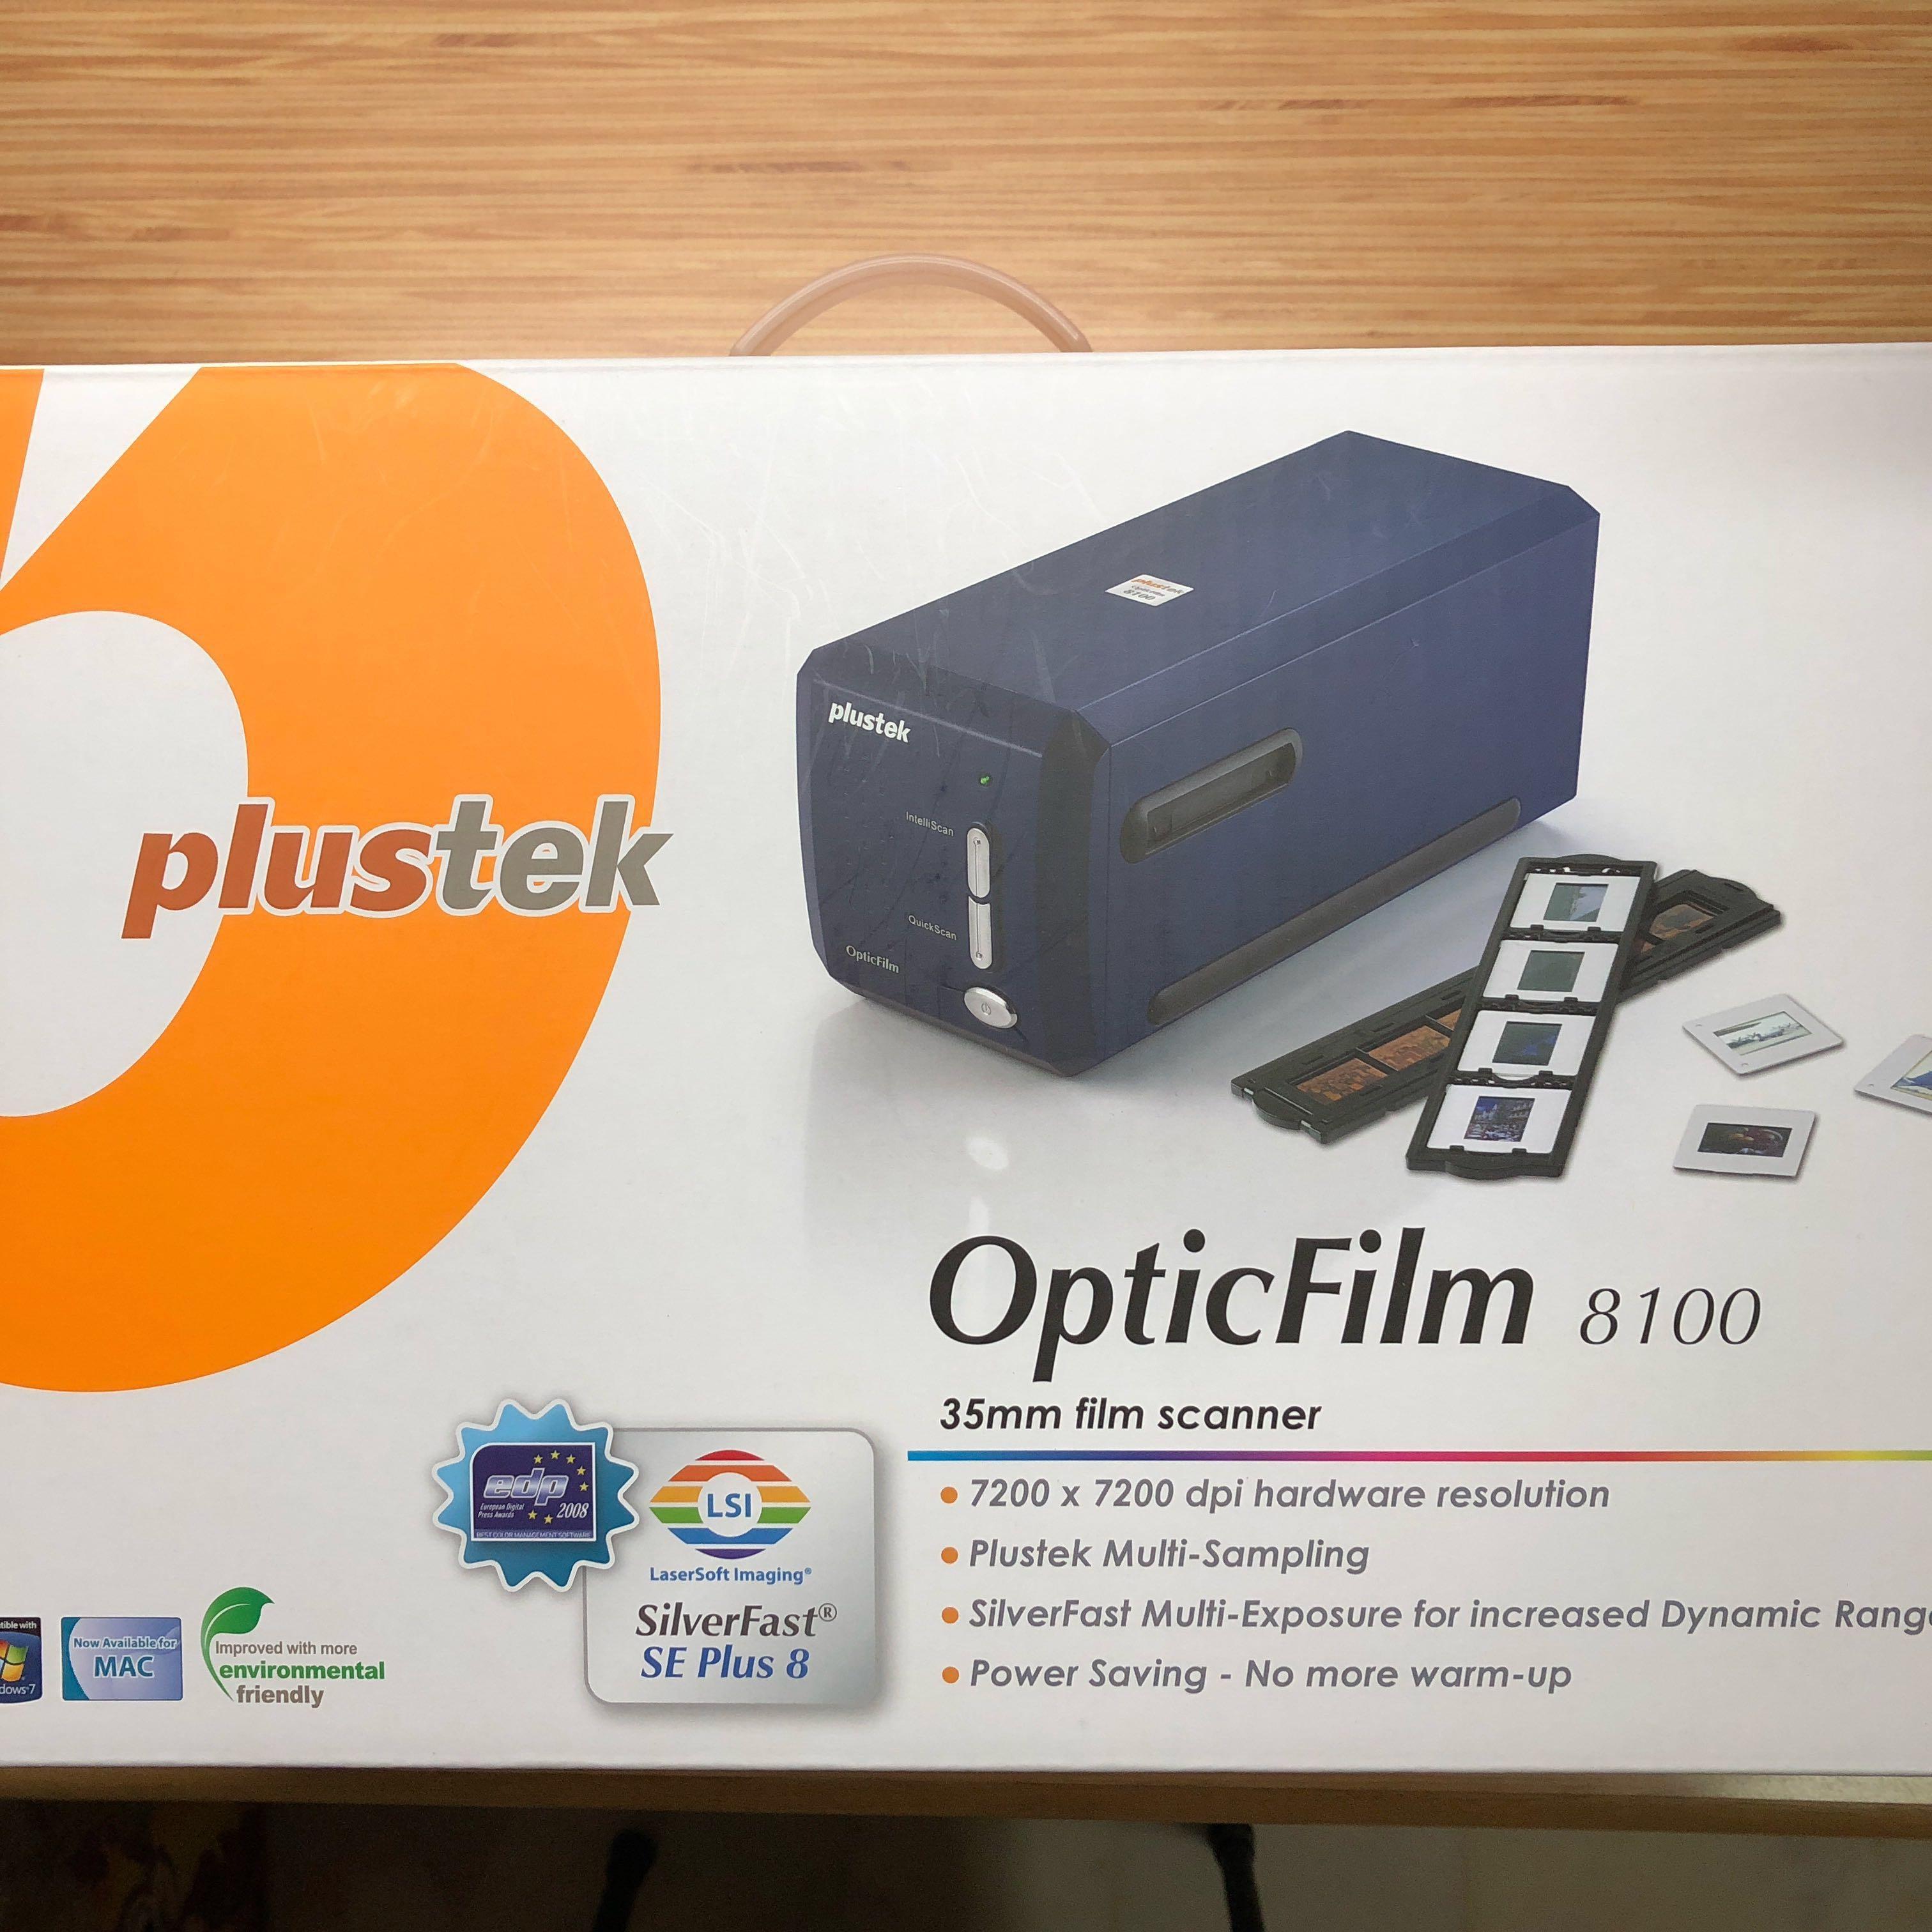 Plustek OpticFilm 8100 Film Scanner, Photography, Camera